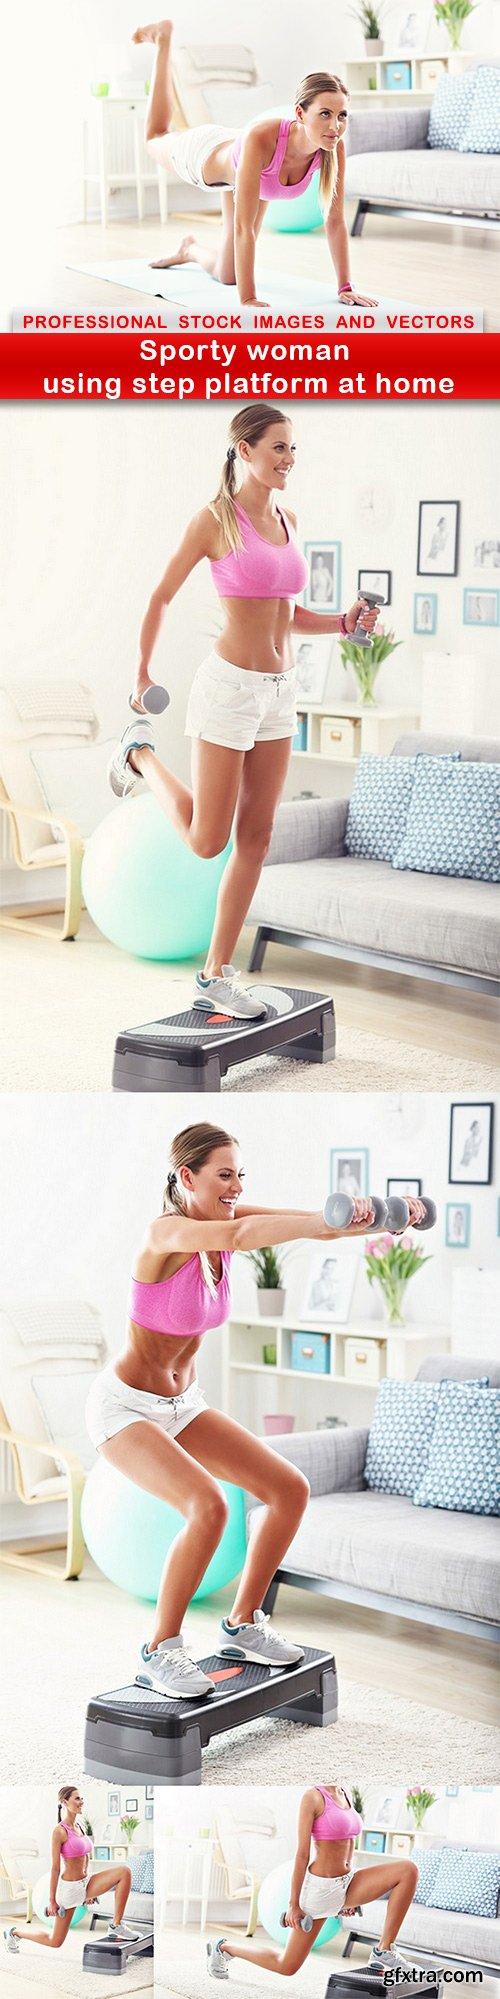 Sporty woman using step platform at home - 5 UHQ JPEG